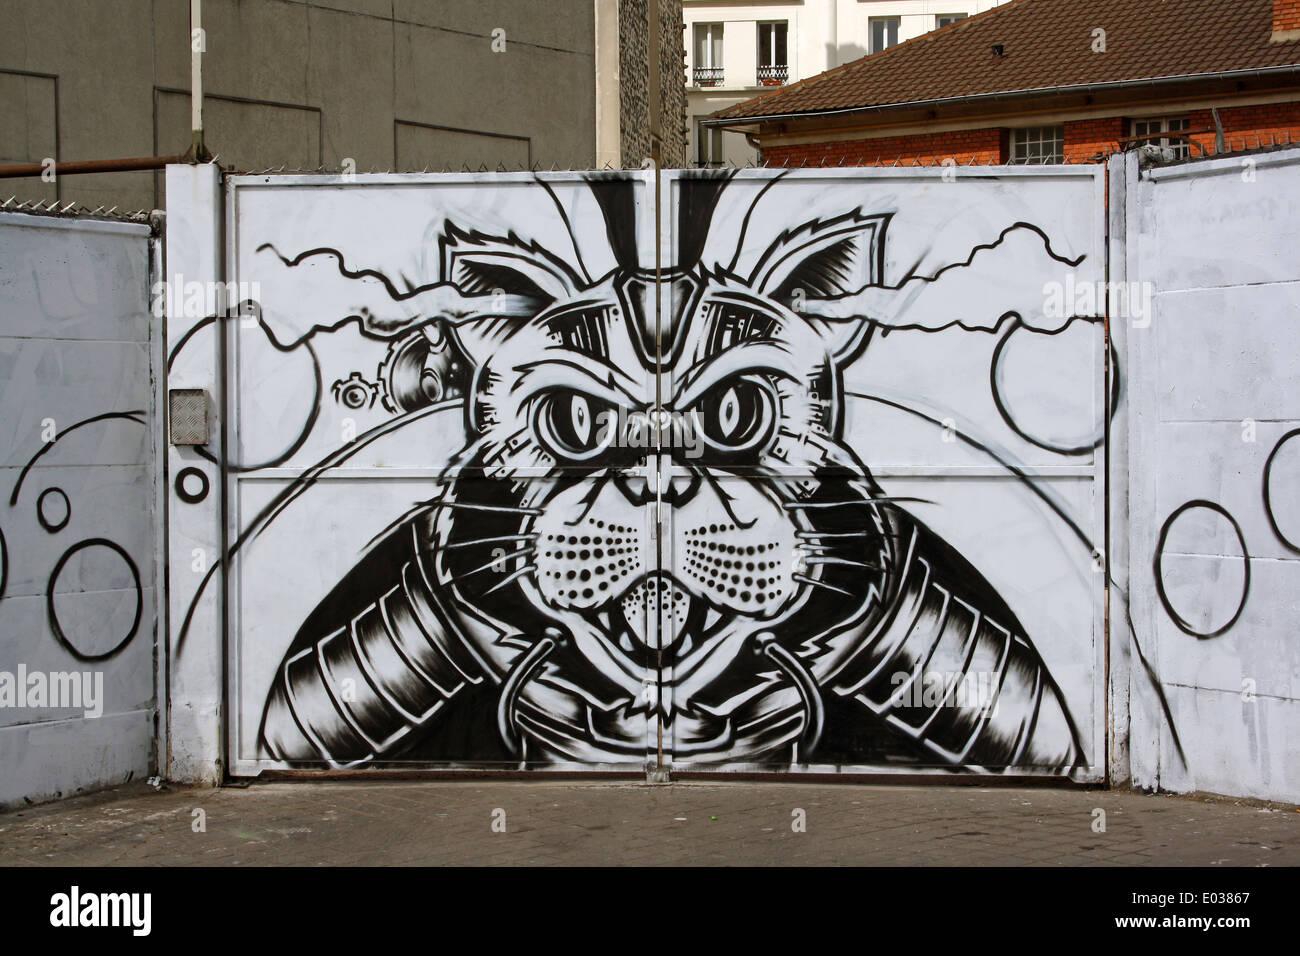 Paris, Ferocious cartoon cat on gates to yard. Stock Photo